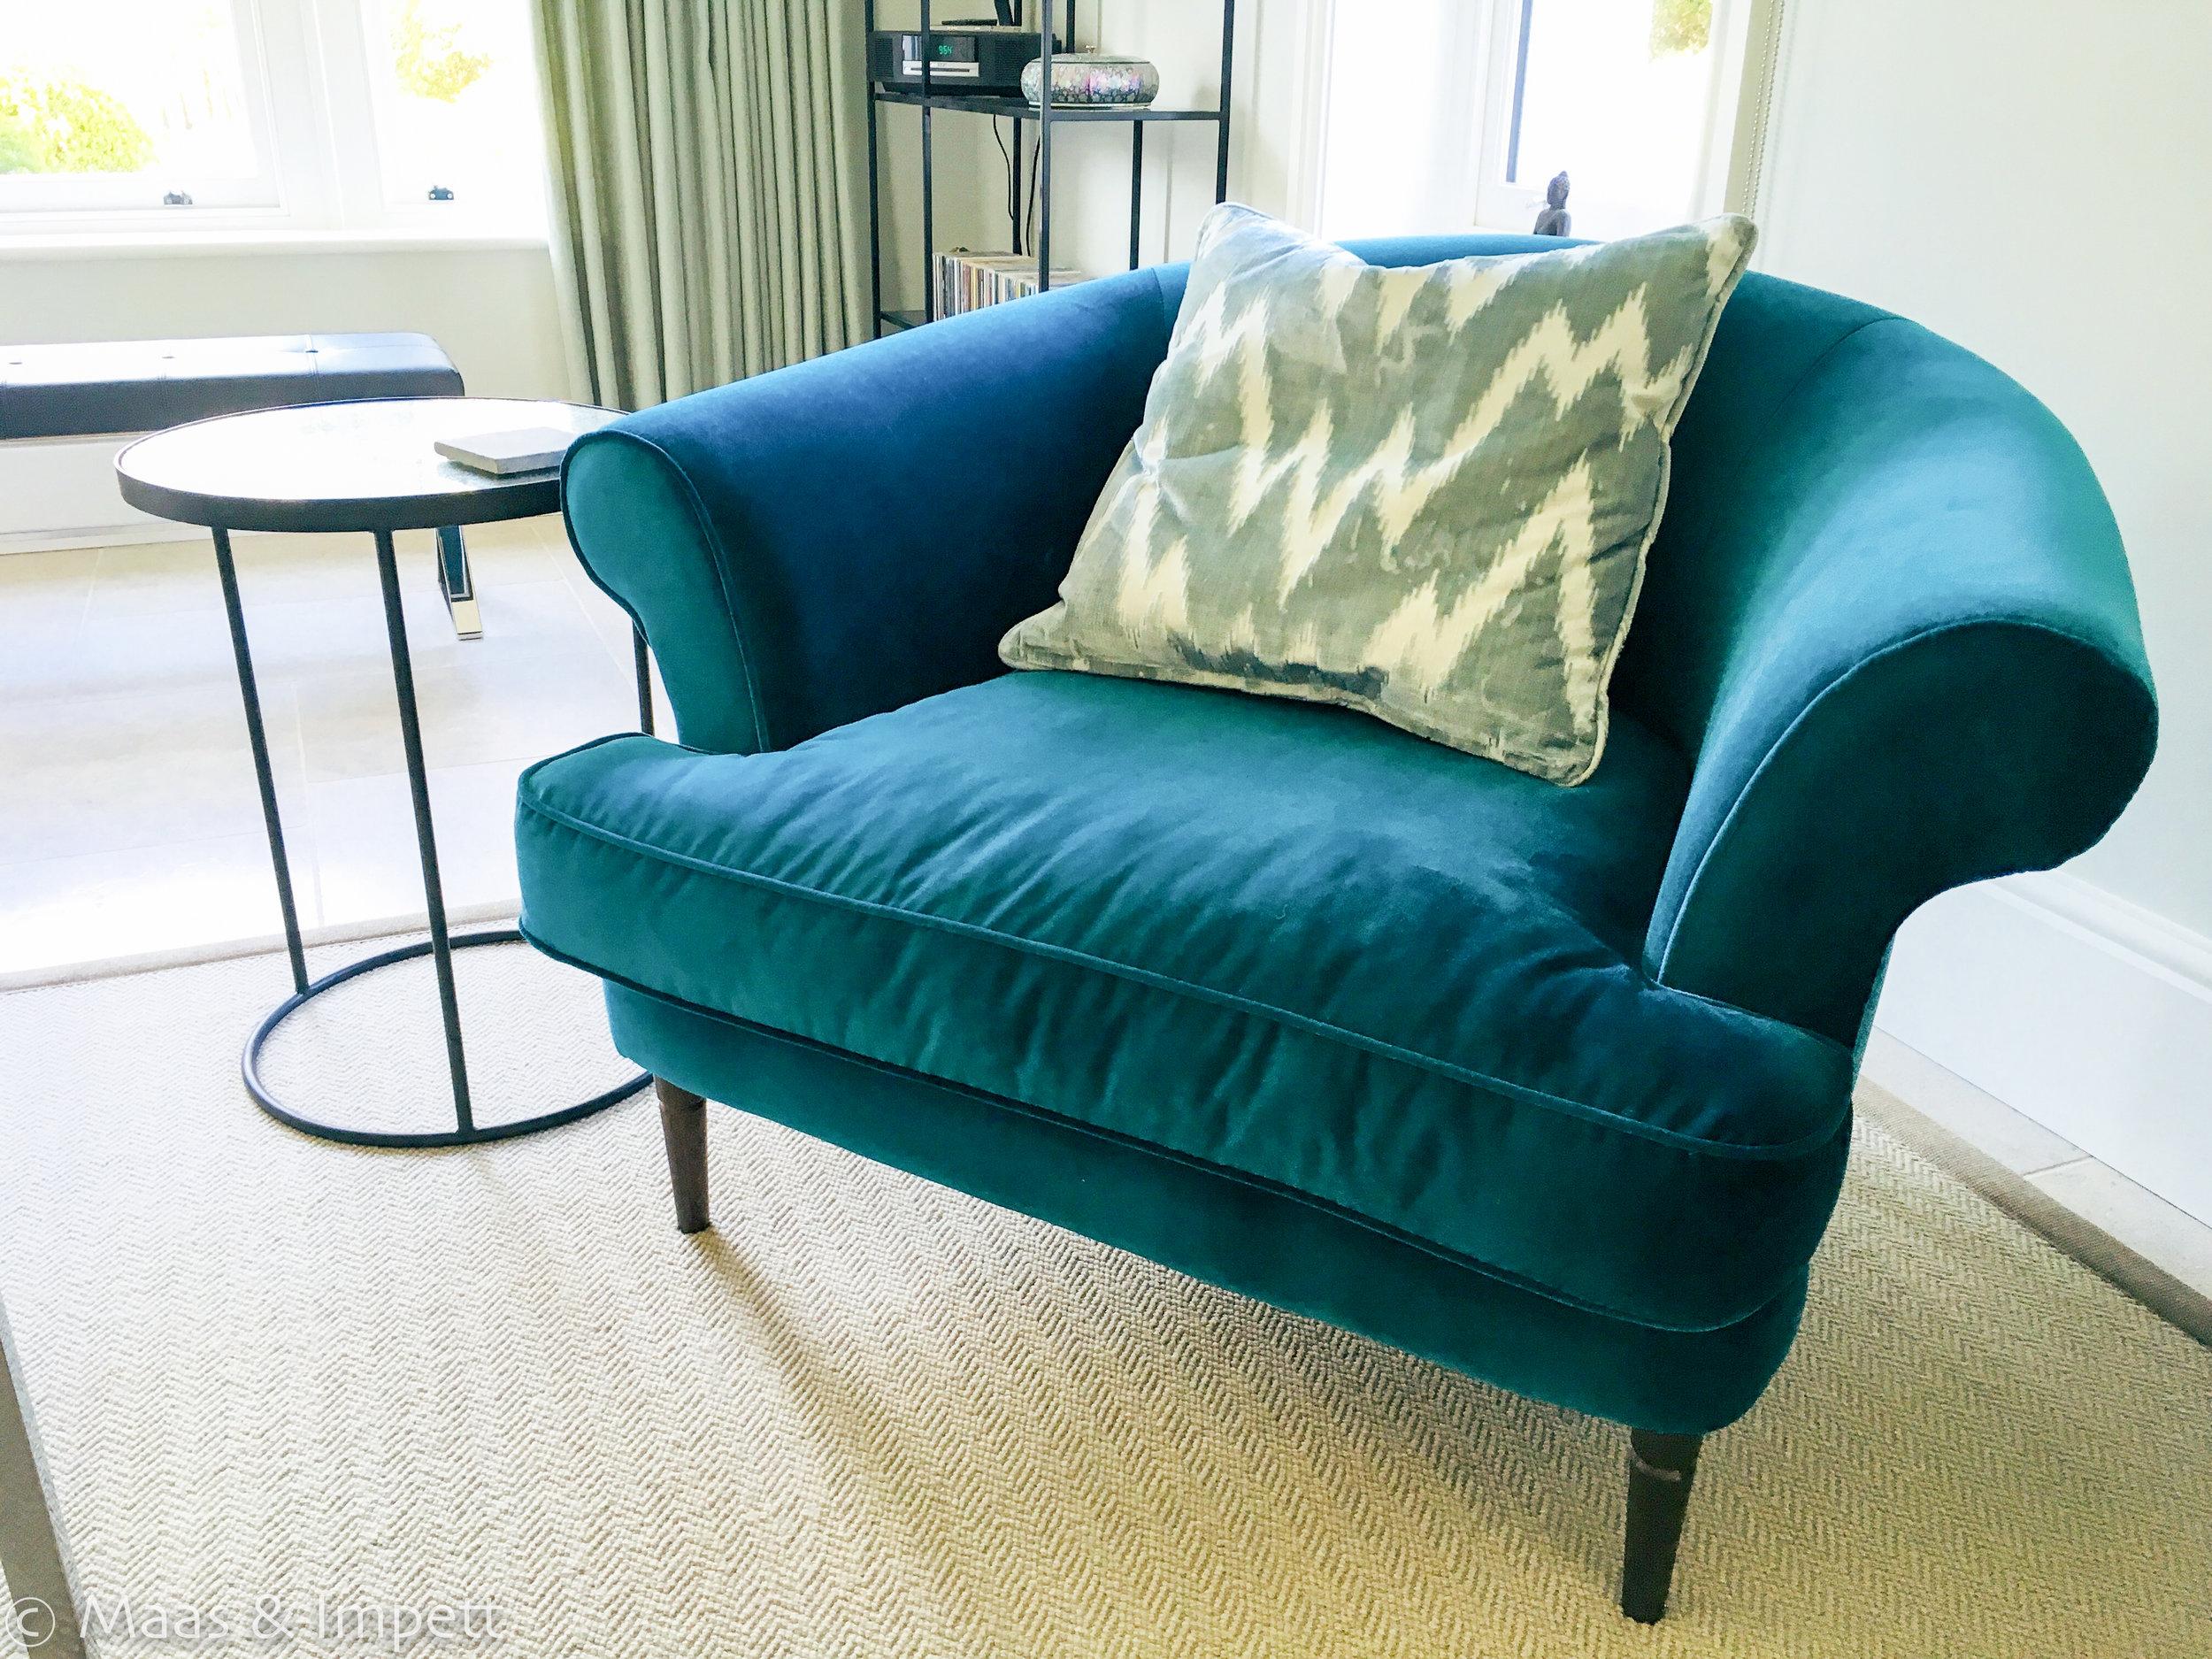 Bespoke Upholstery, Interior designers, Hampshire